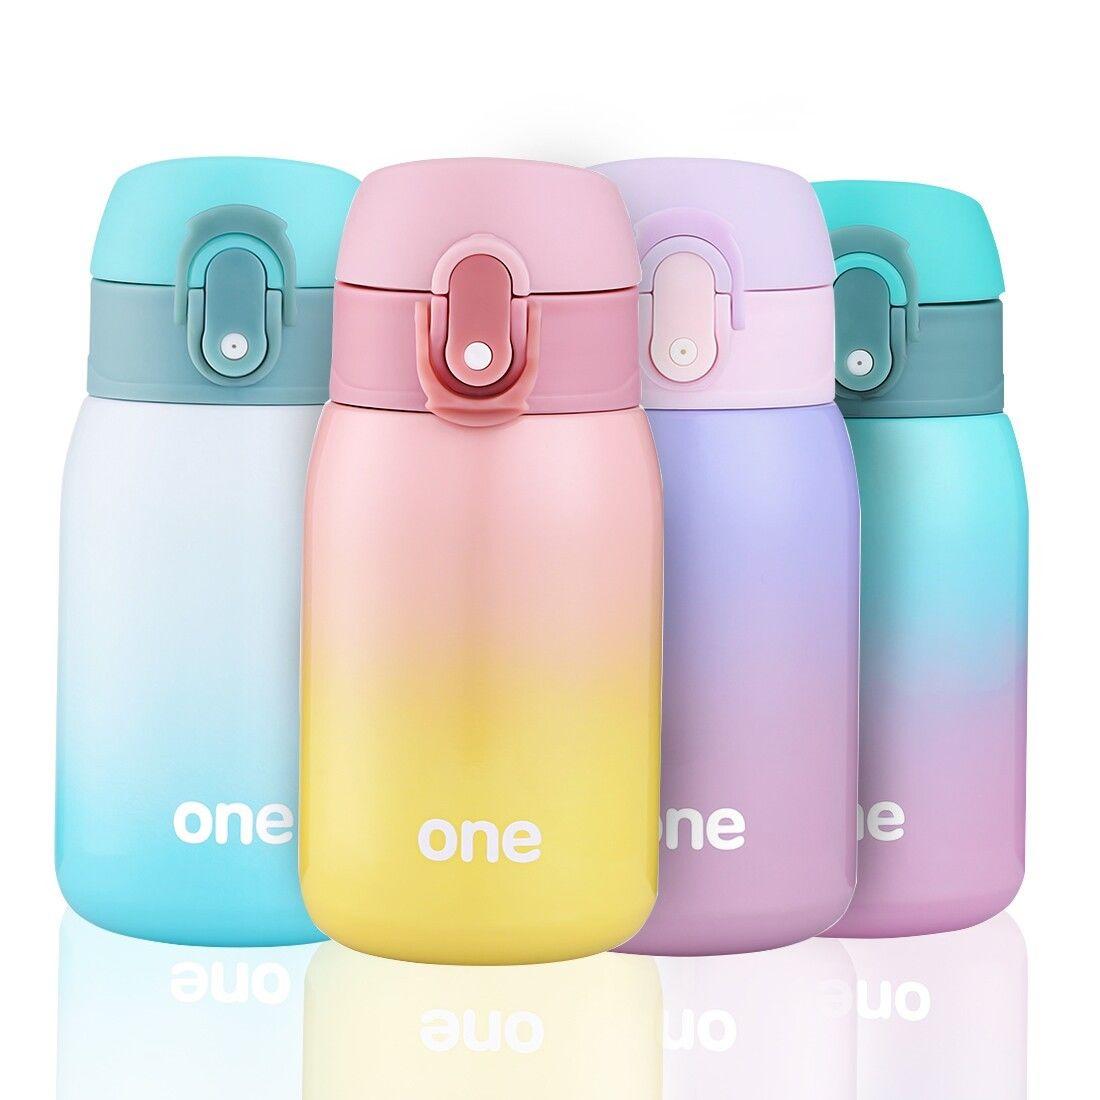 220ml Mini Thermos Mug Vacuum Insulated Bottle Steel Travel Coffee Mug,Insulation Water Bottle For Kids,thermos Mug Leak Proof